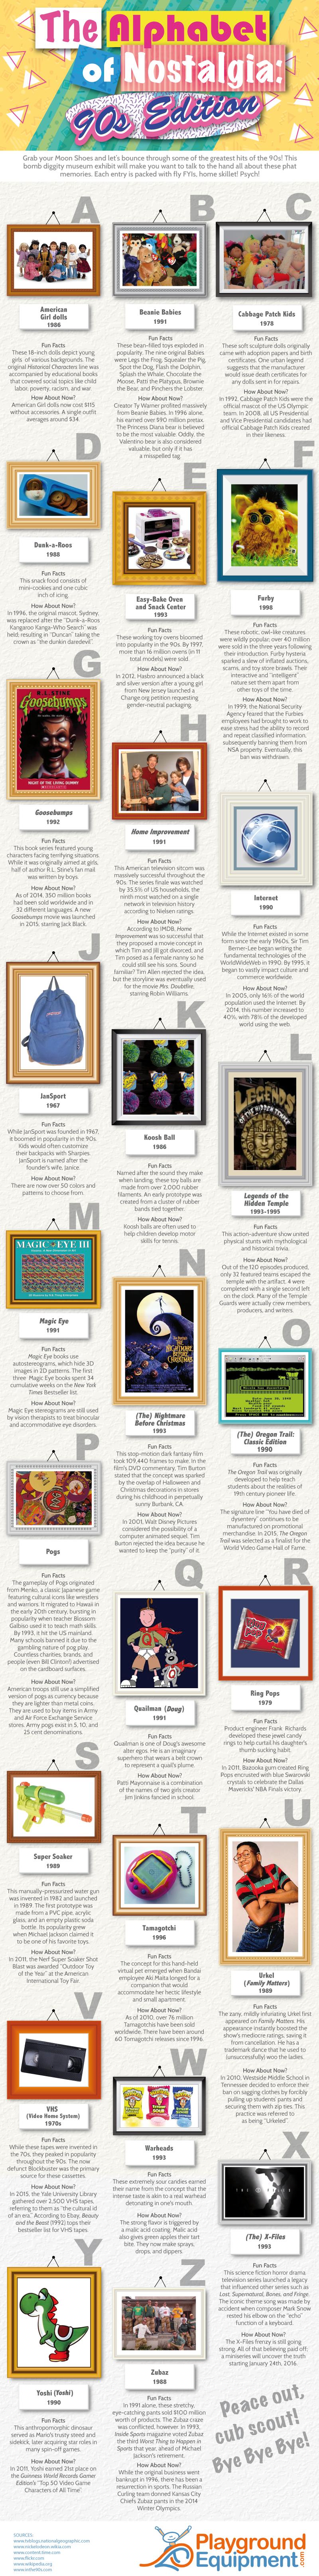 Alphabet of Nostalgia: 90s Edition - PlaygroundEquipment.com - Infographic